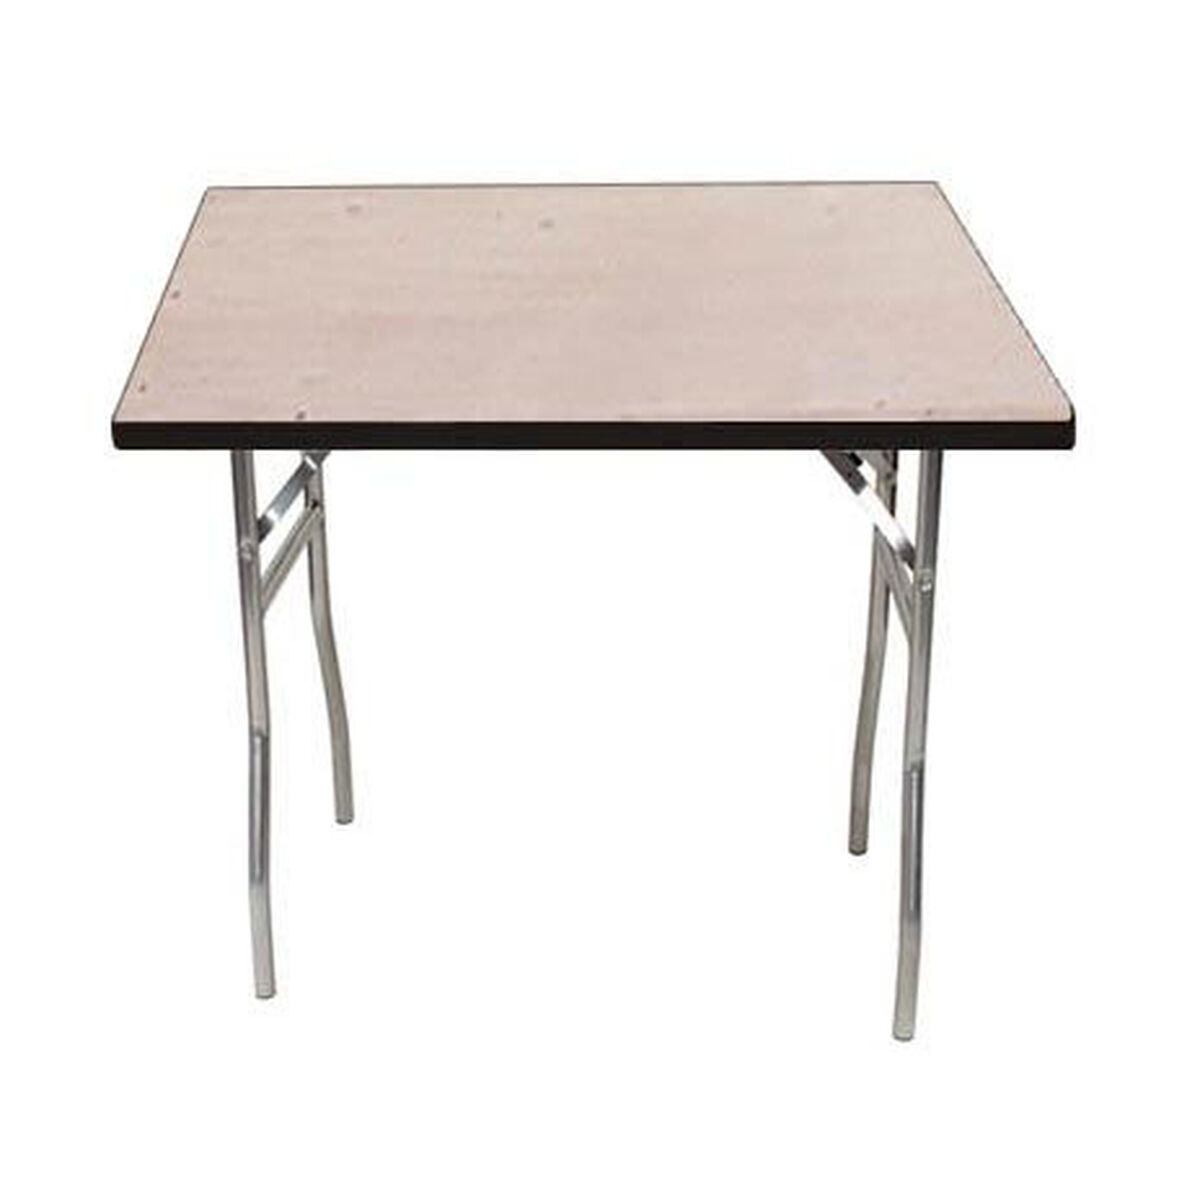 Maywood furniture standard series 48 square folding banquet table maywood furniture standard series 48 square folding banquet table with plywood top mp48sqfld foldingchairs4less watchthetrailerfo